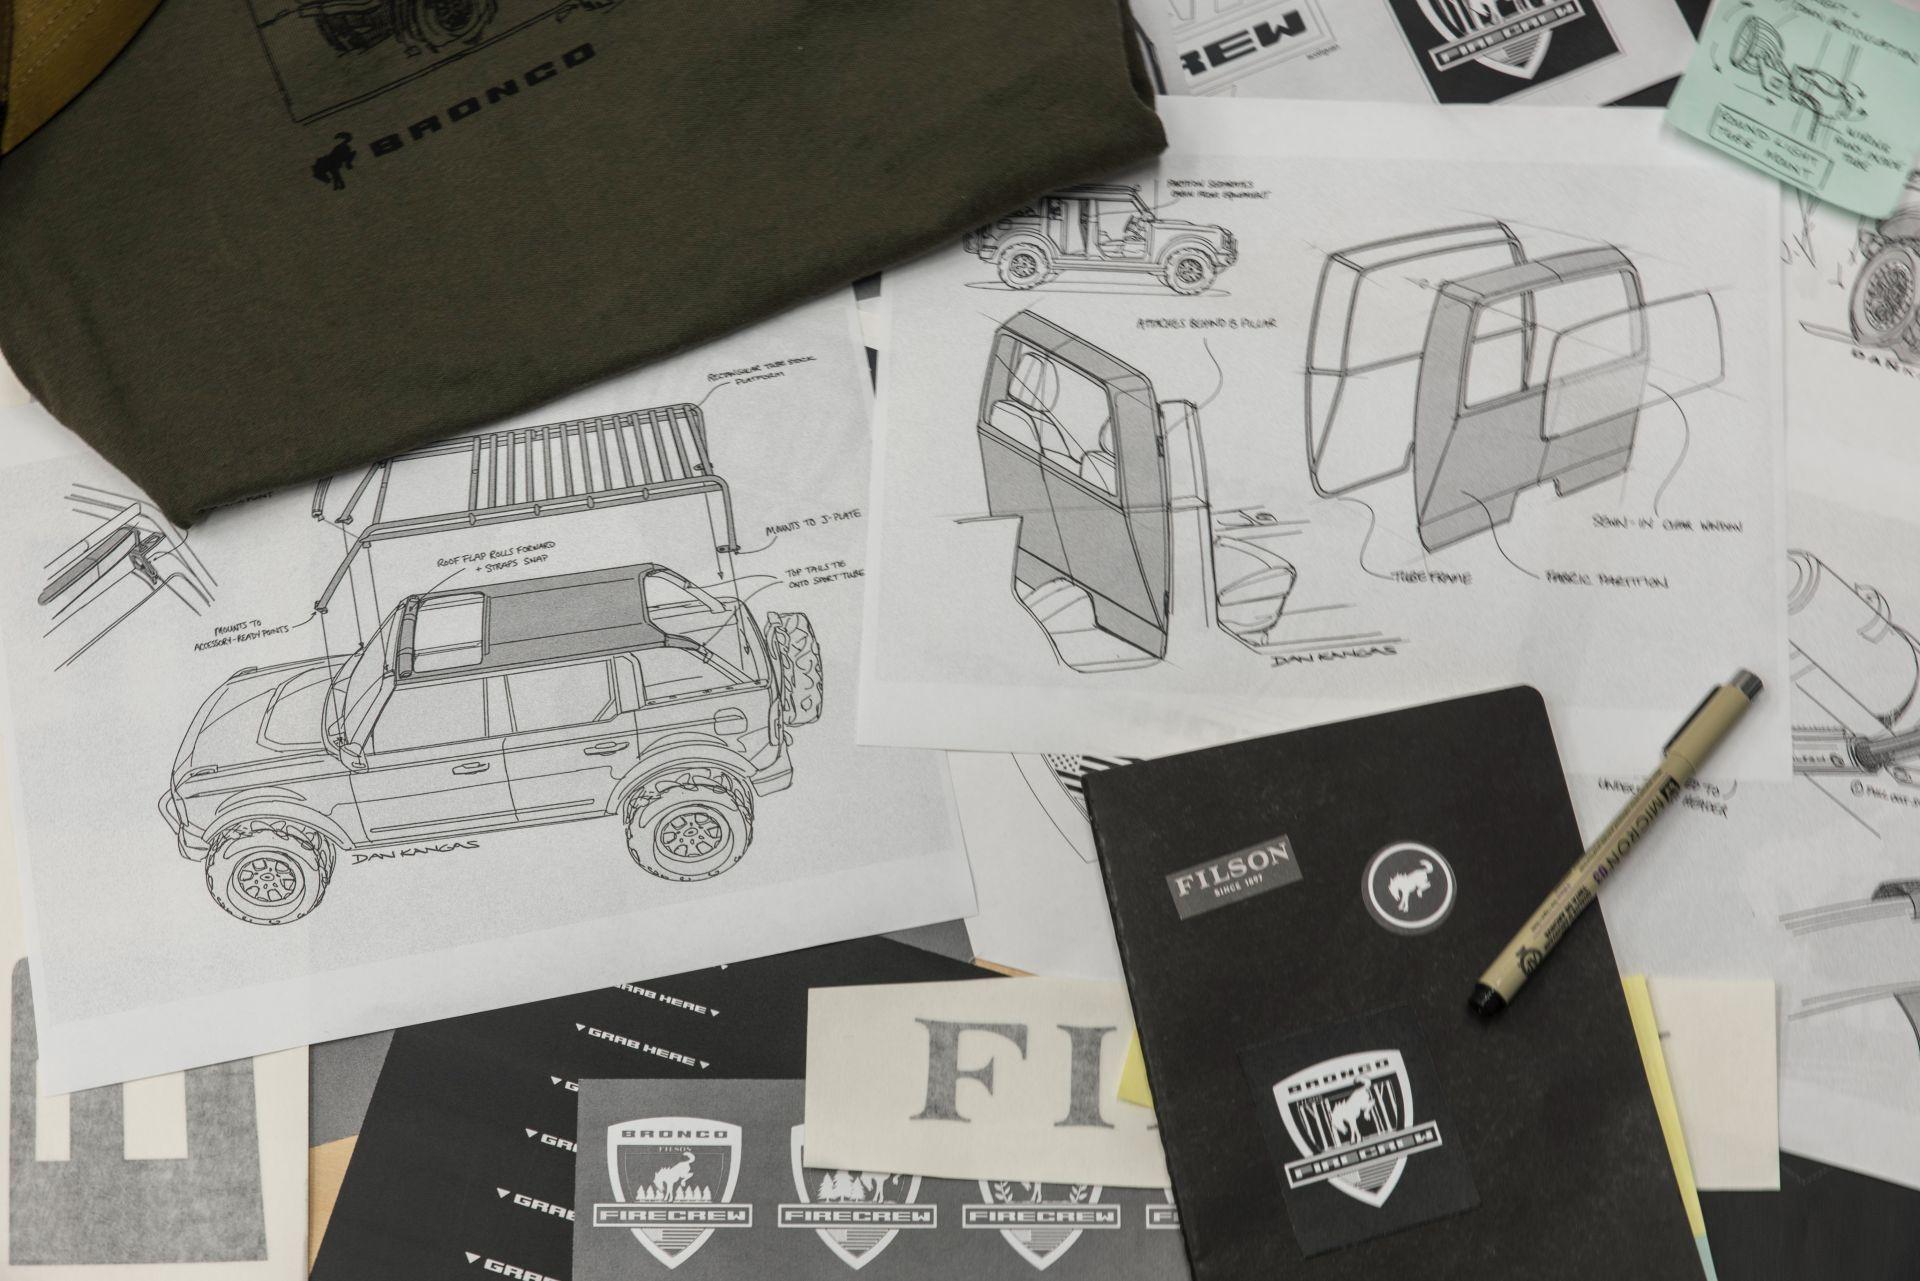 Ford-Bronco-Wildland-Fire-Rig-Concept-14